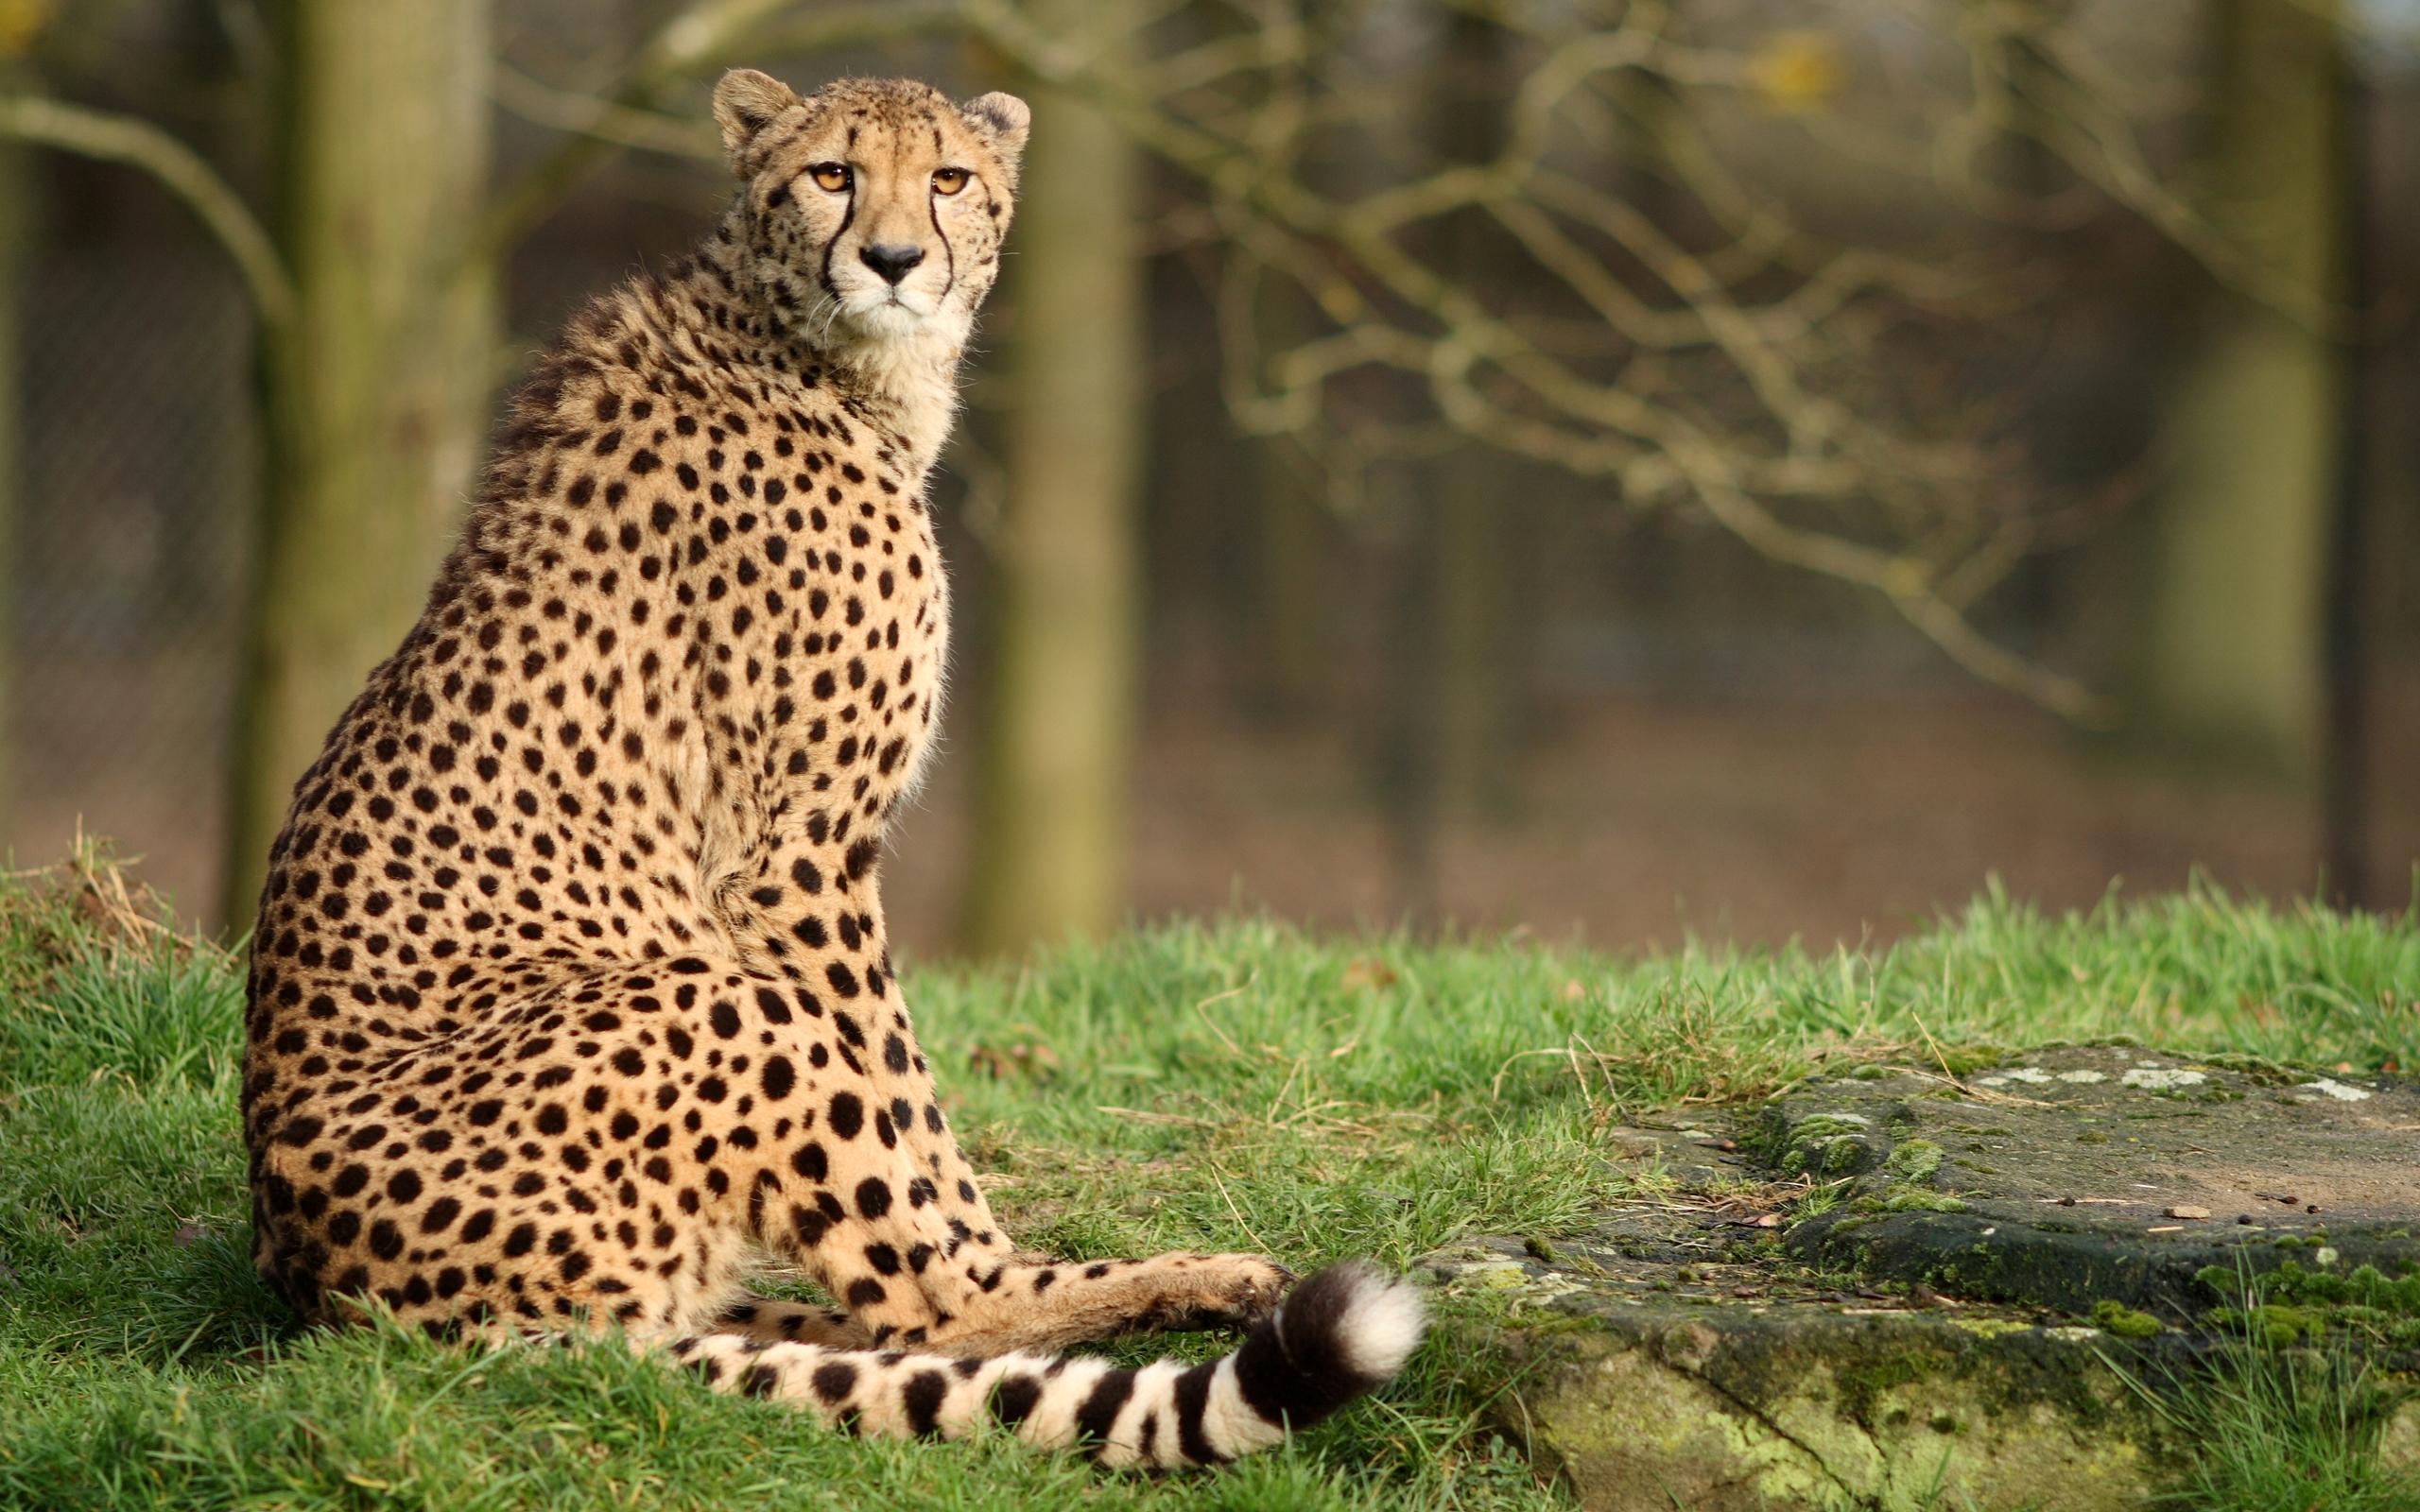 Cheetah quotes - photo#28